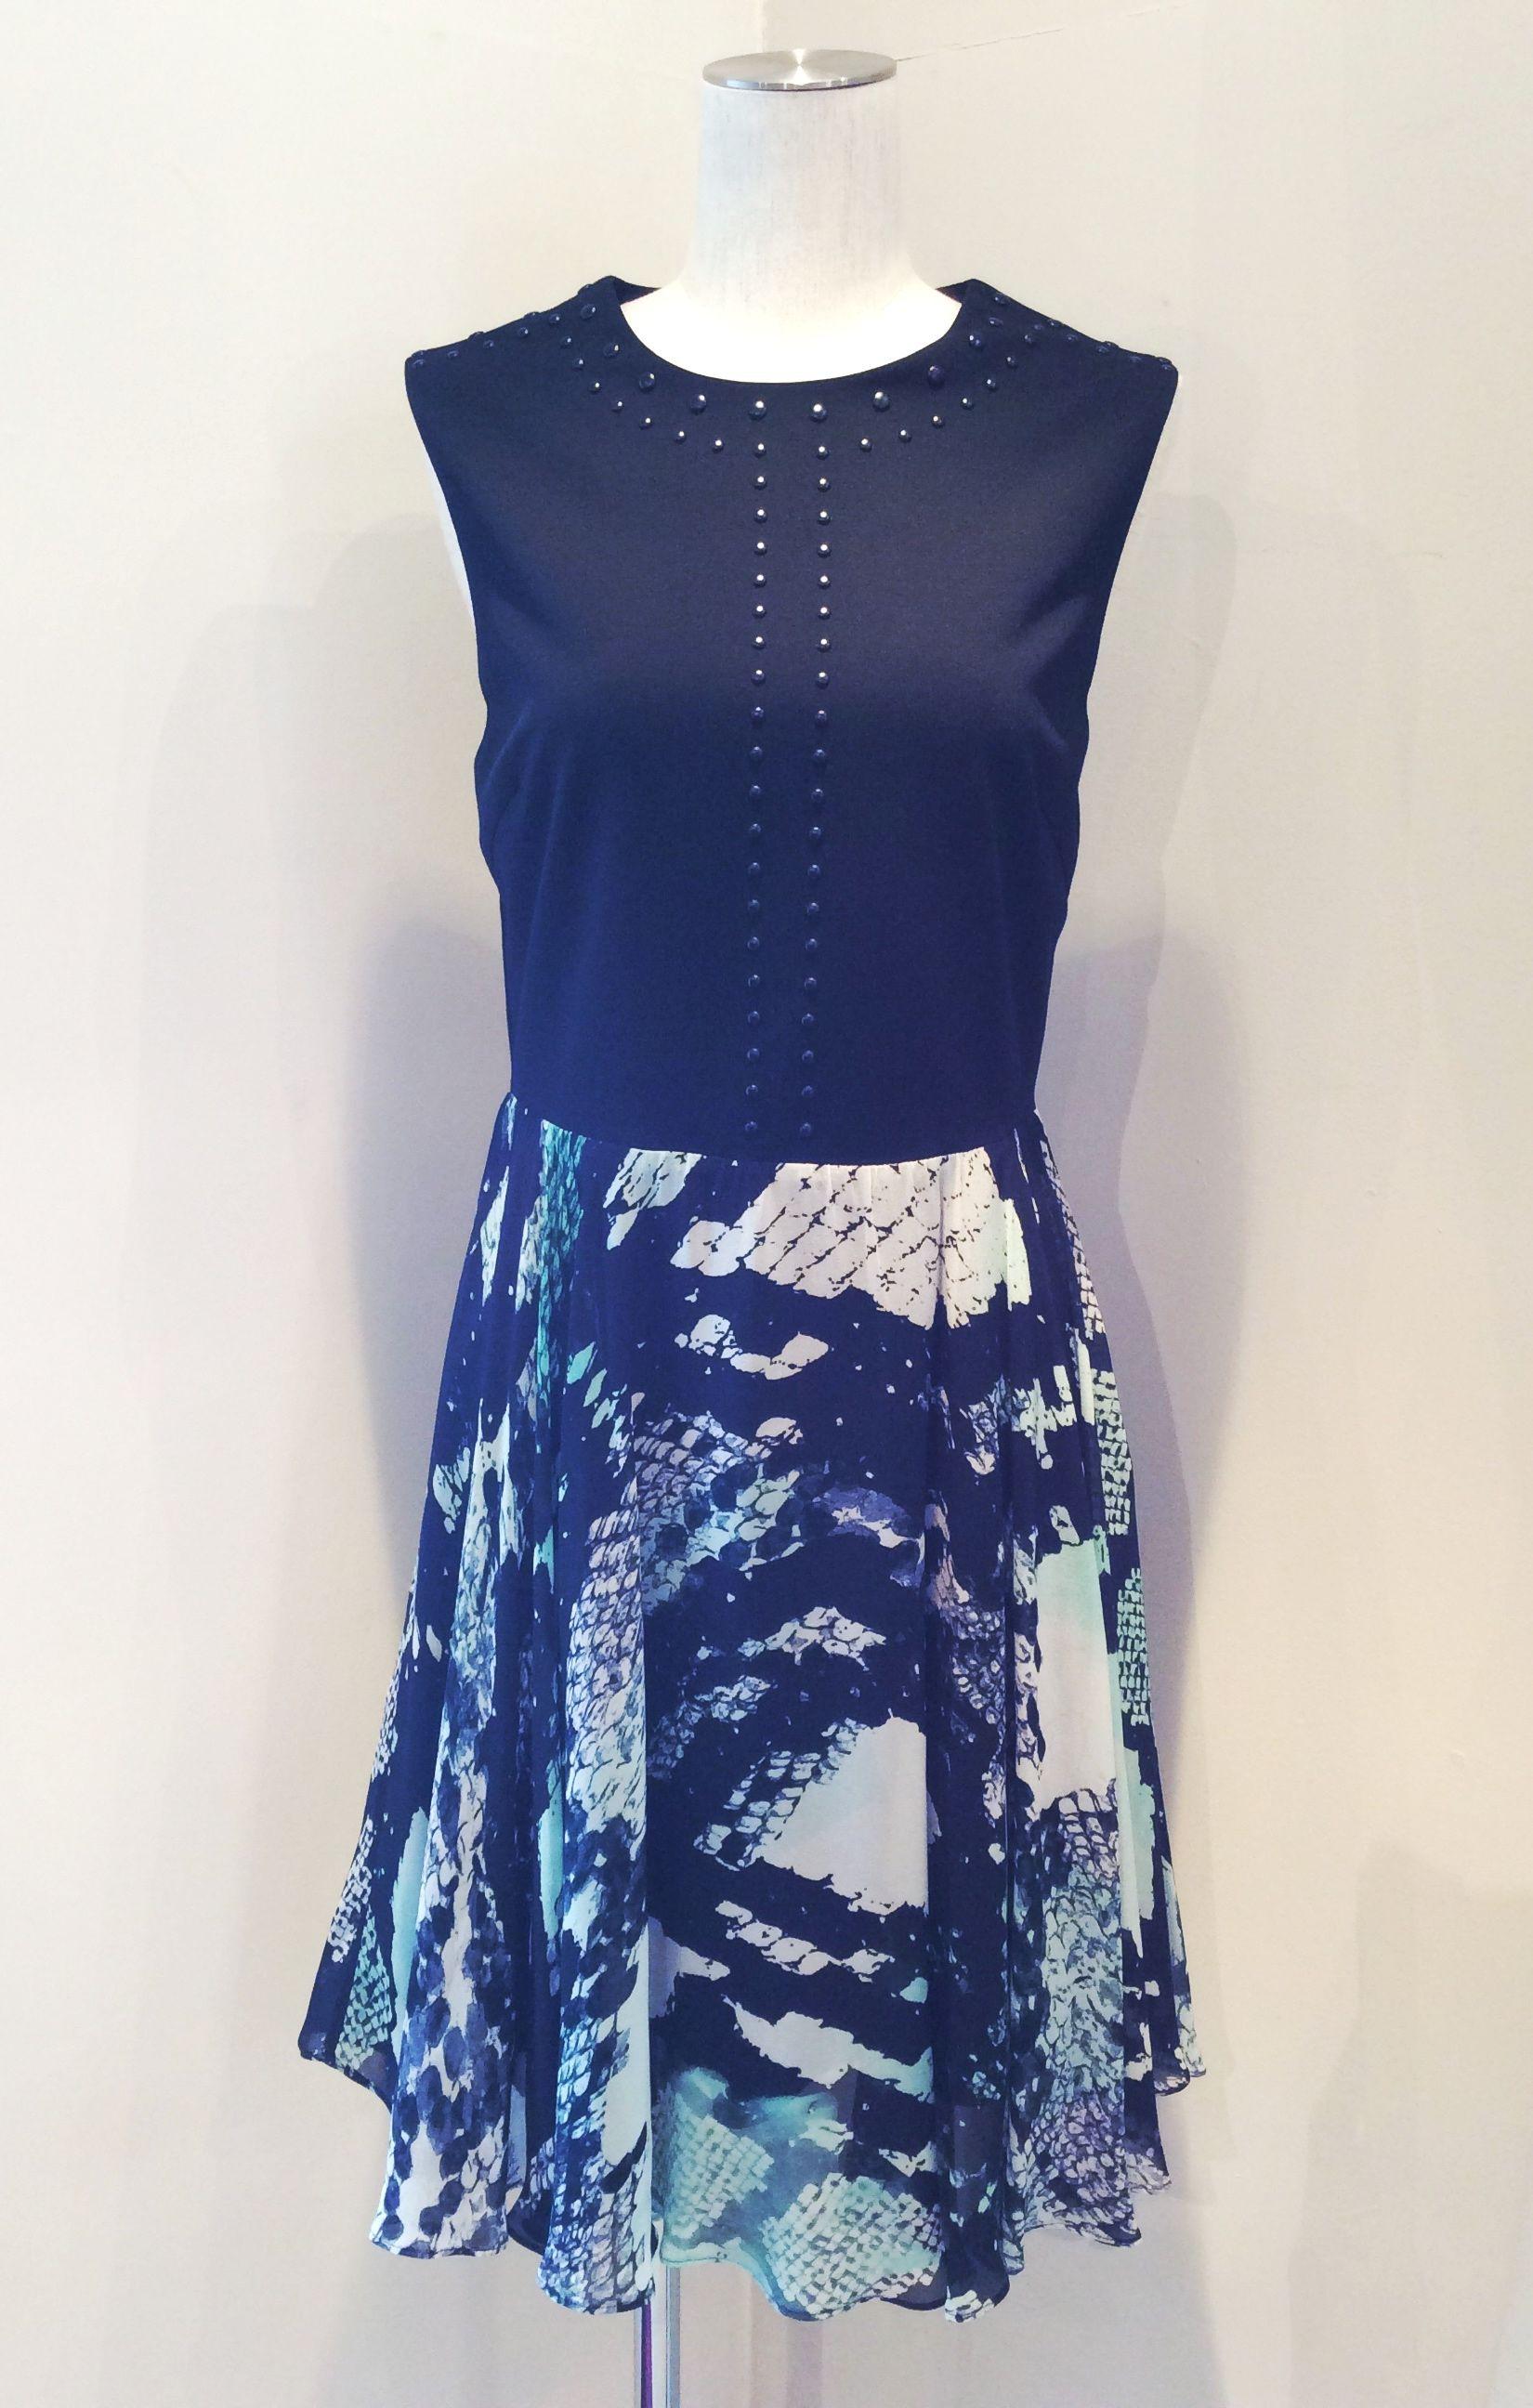 PINKO(ピンコ)  dress  1G12Y1-Y44S